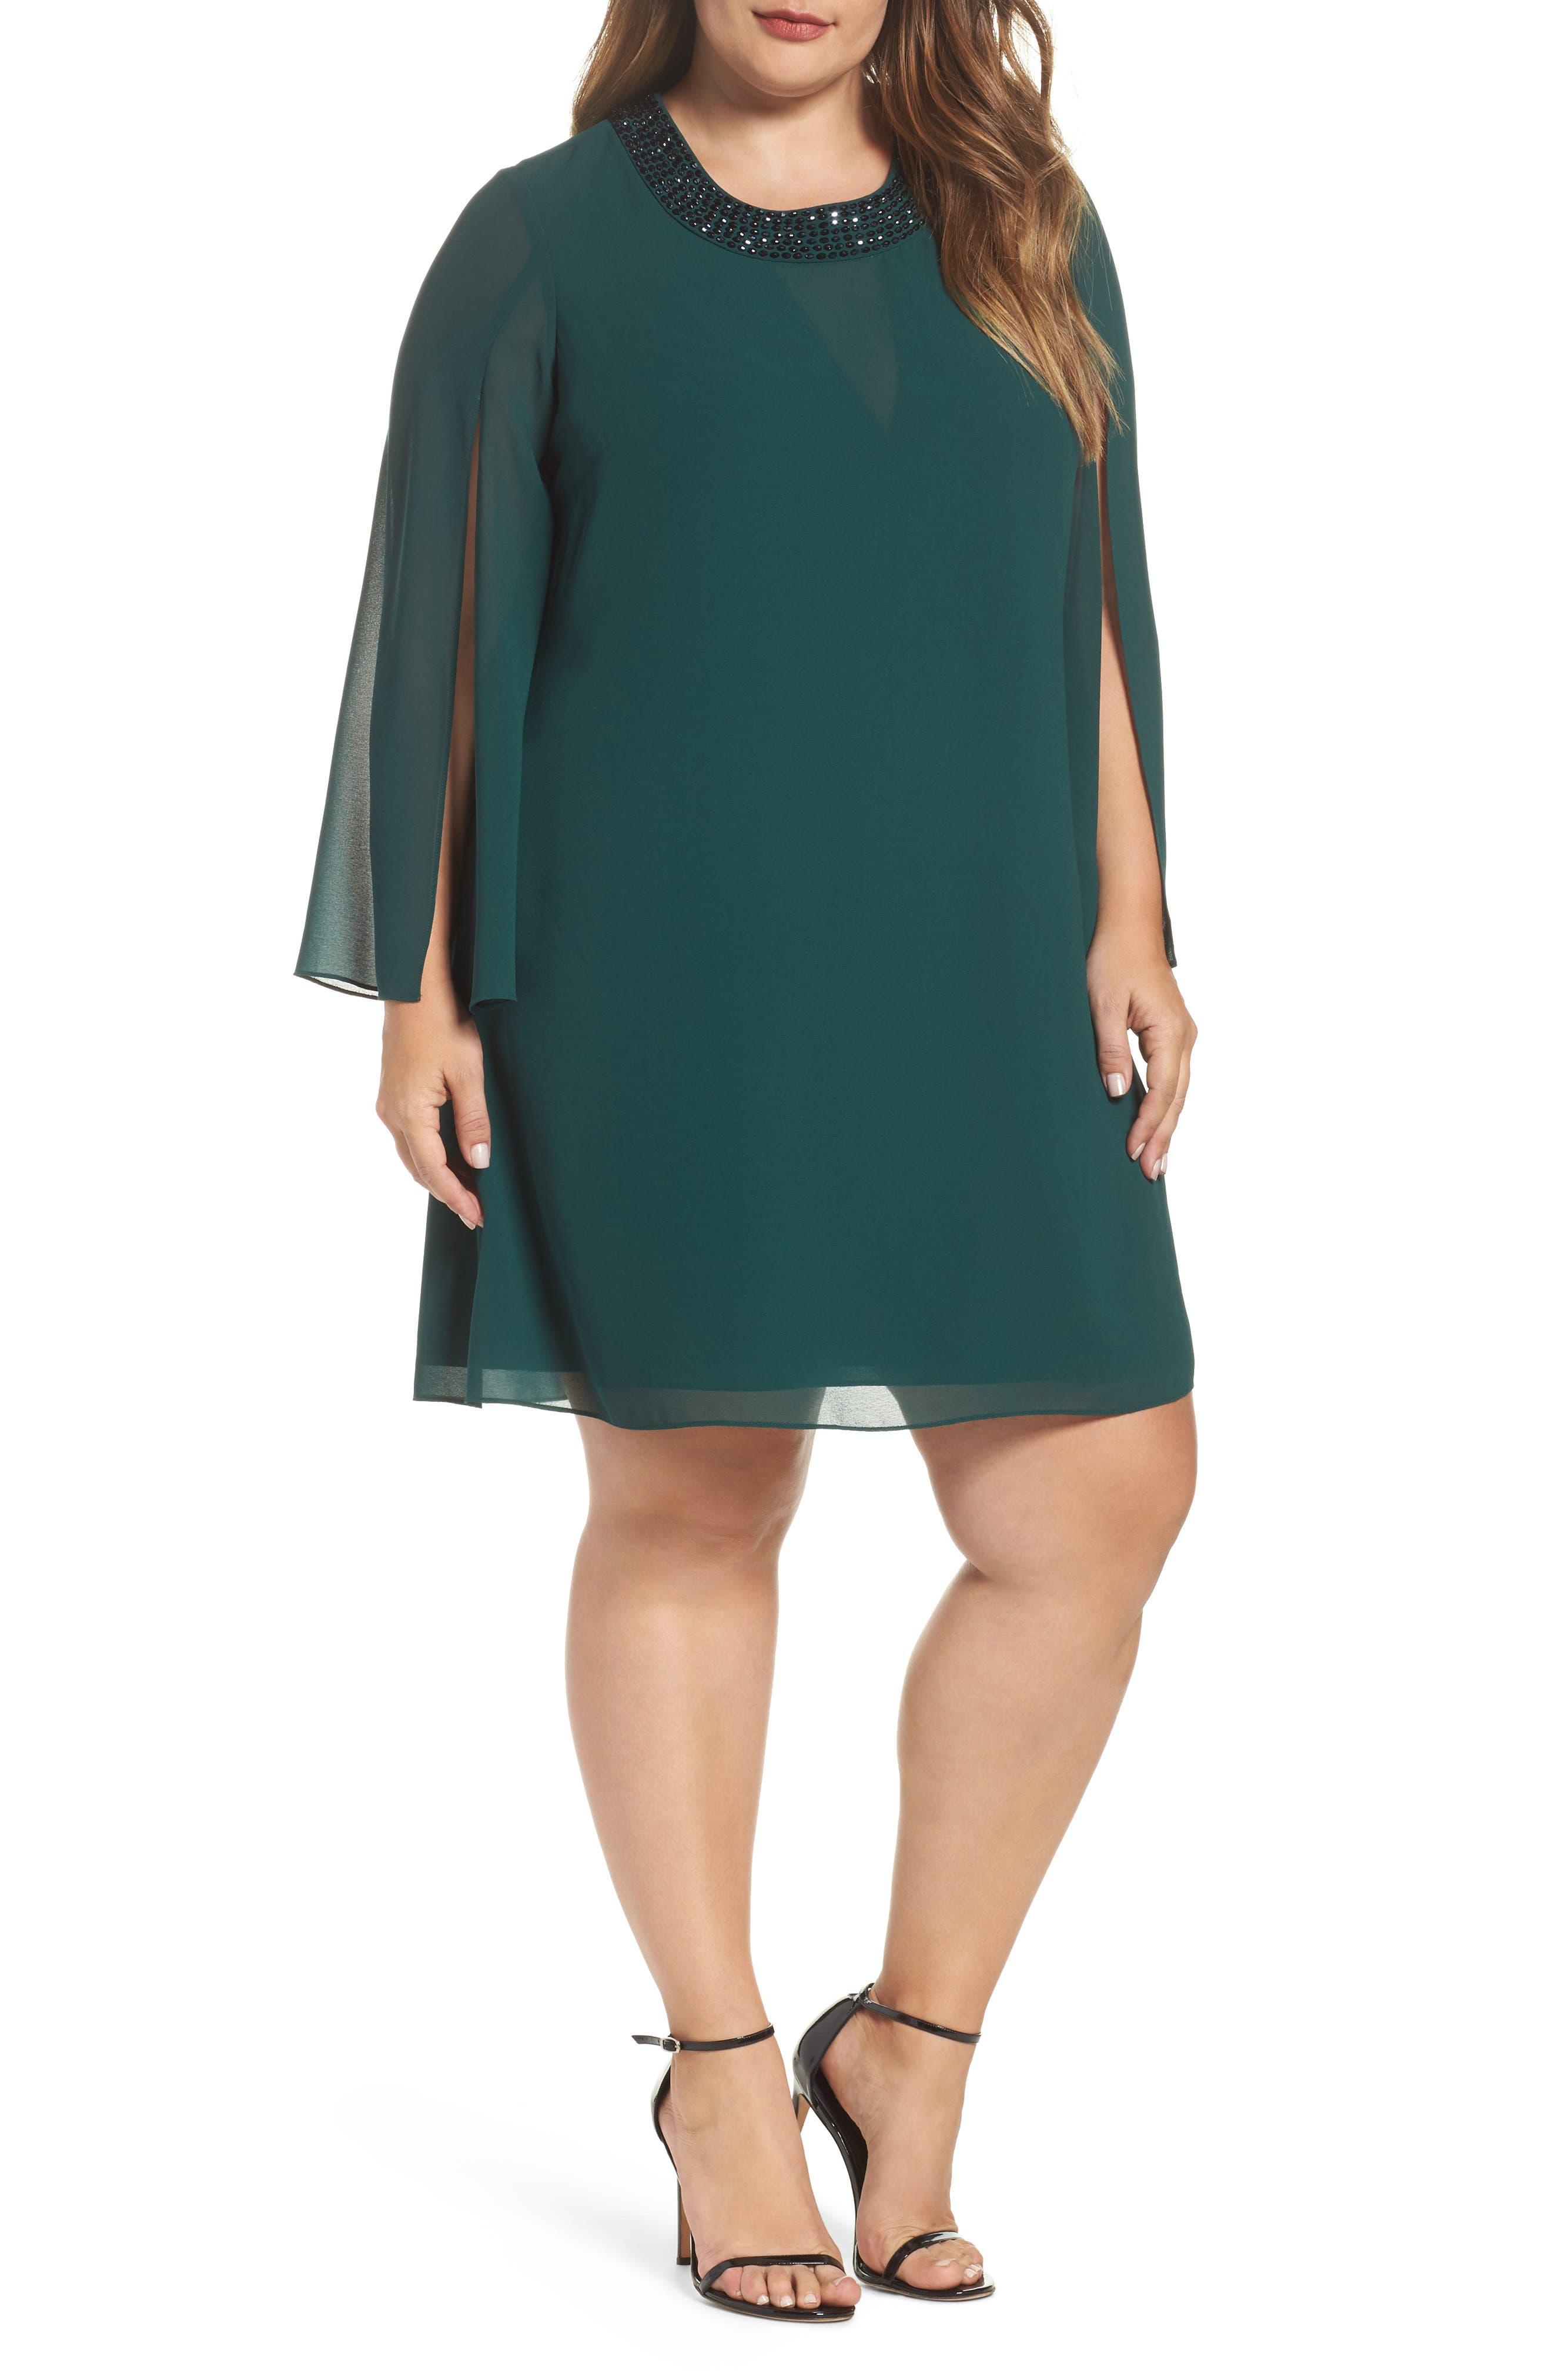 Vince Camuto Embellished Neck Chiffon Shift Dress (Plus Size)